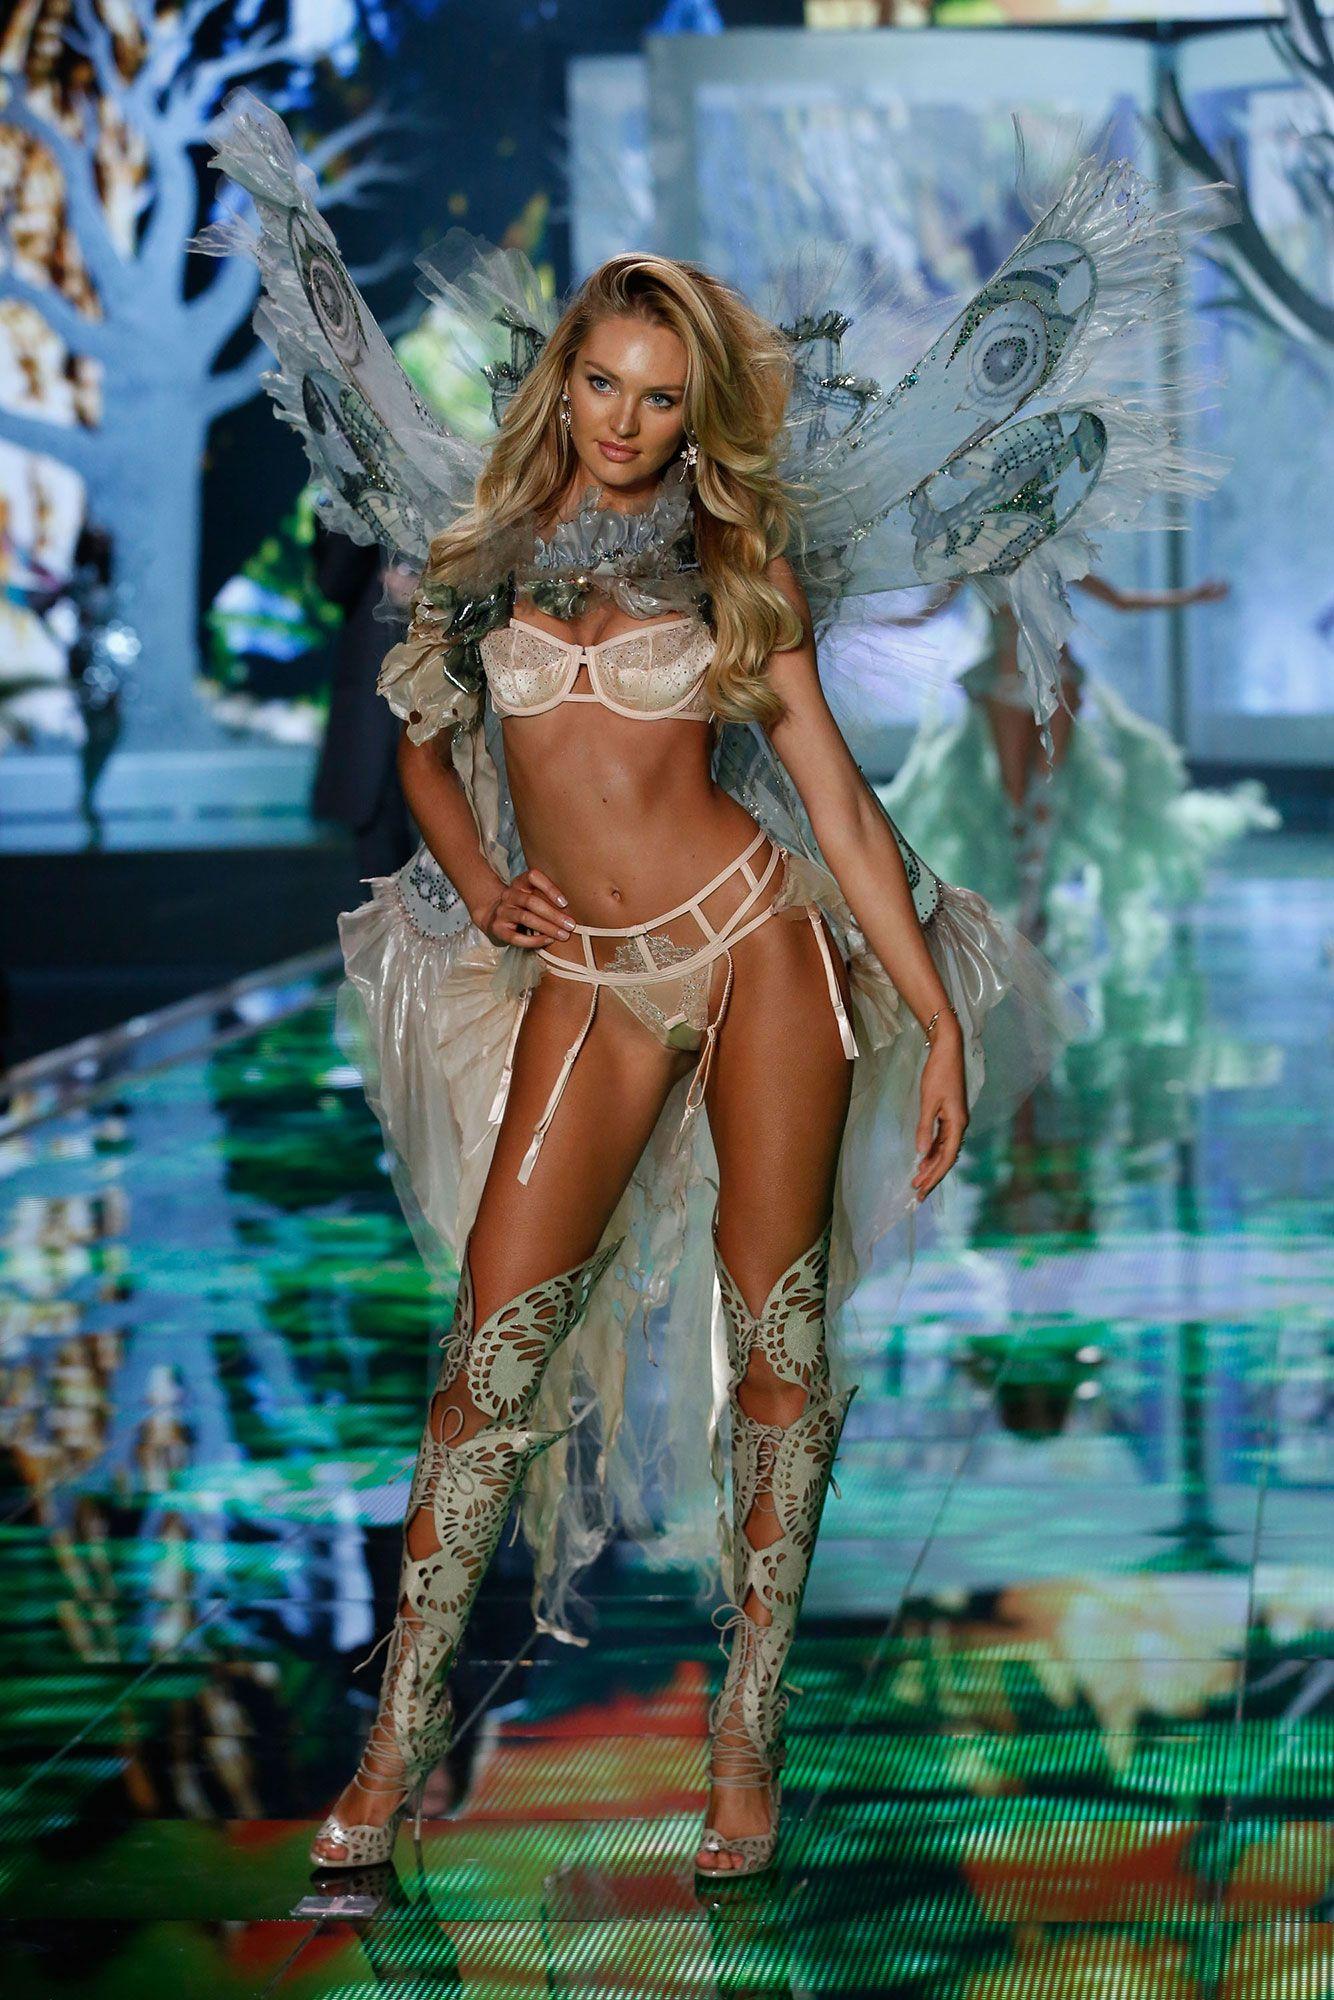 5260ac7b90b Victoria s Secret Fashion Show 2014 - Candice Swanepoel walks in the 2014 Victoria s  Secret Fashion Show